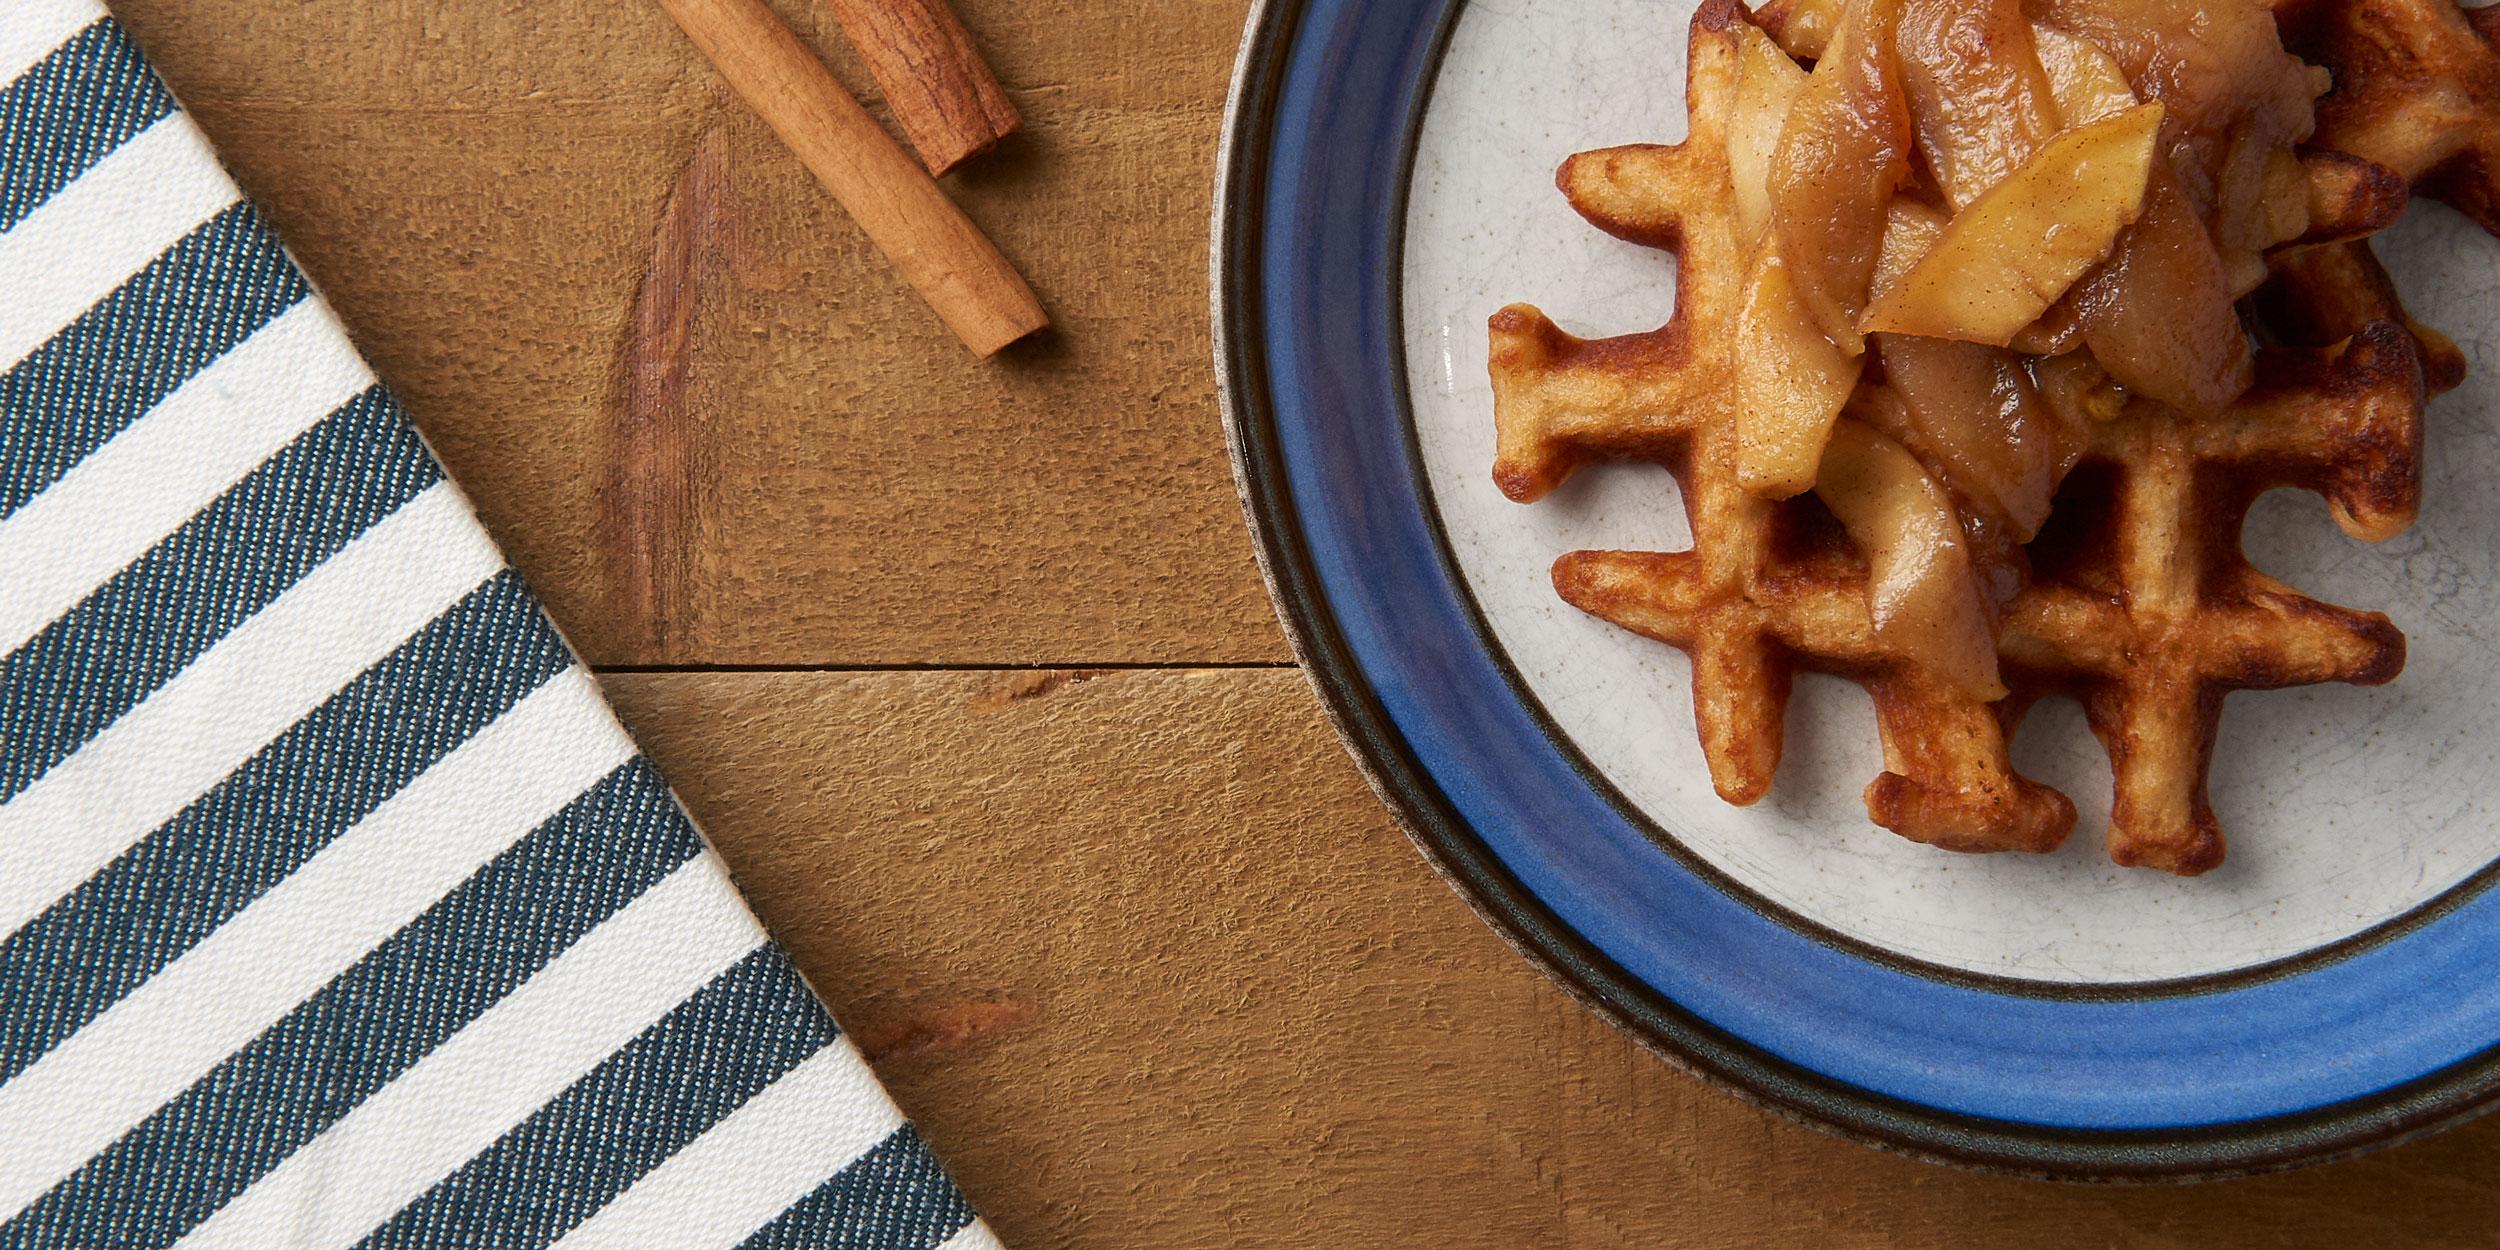 180926---Waffles-0194.jpg